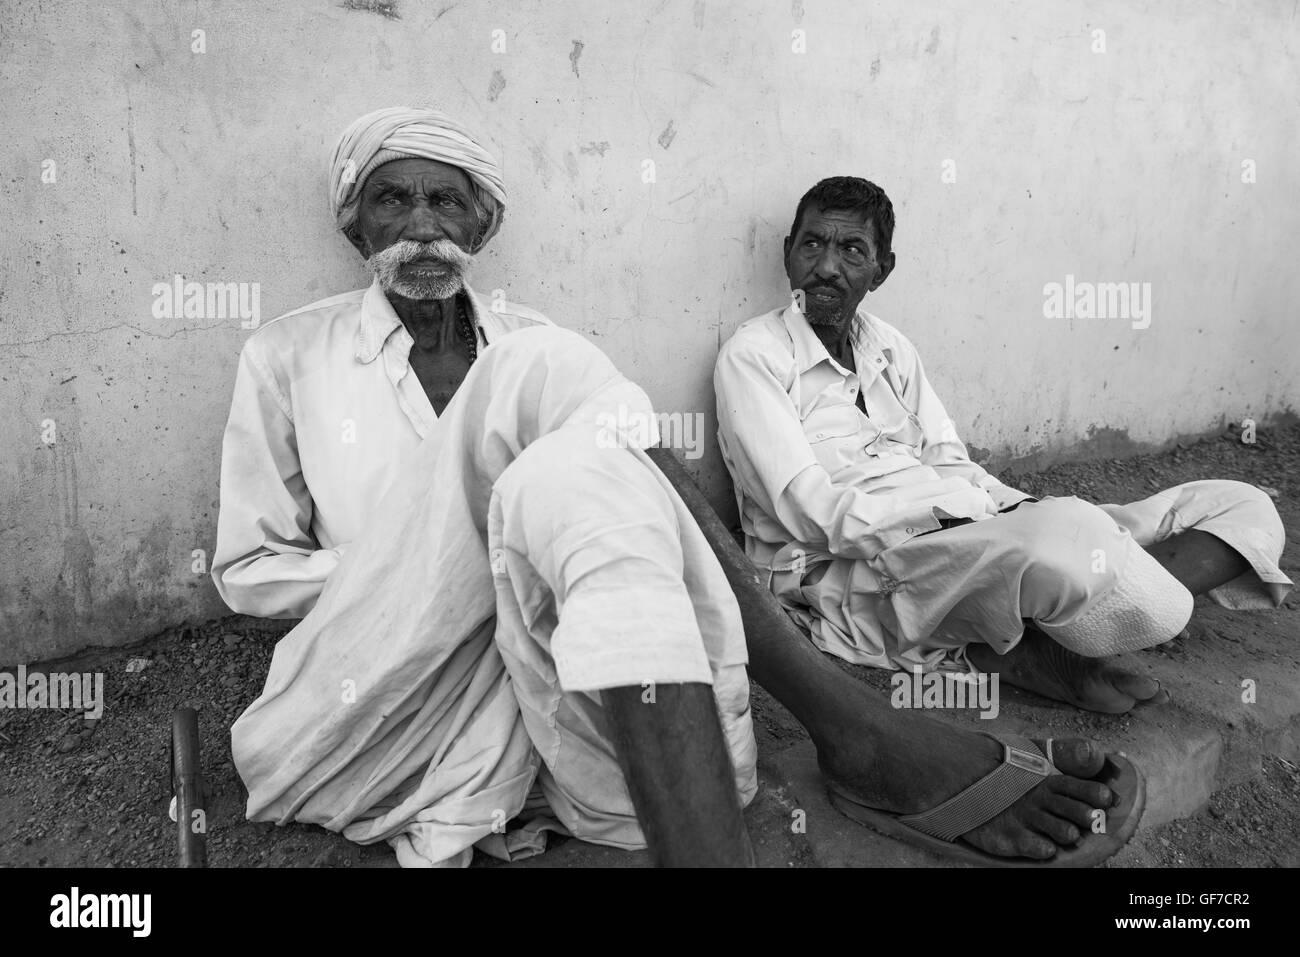 Elderly rabari men chilling in the shade in the afternoon heat. Bhujodi village, Bhuj area, Kutch, Gujarat, India - Stock Image